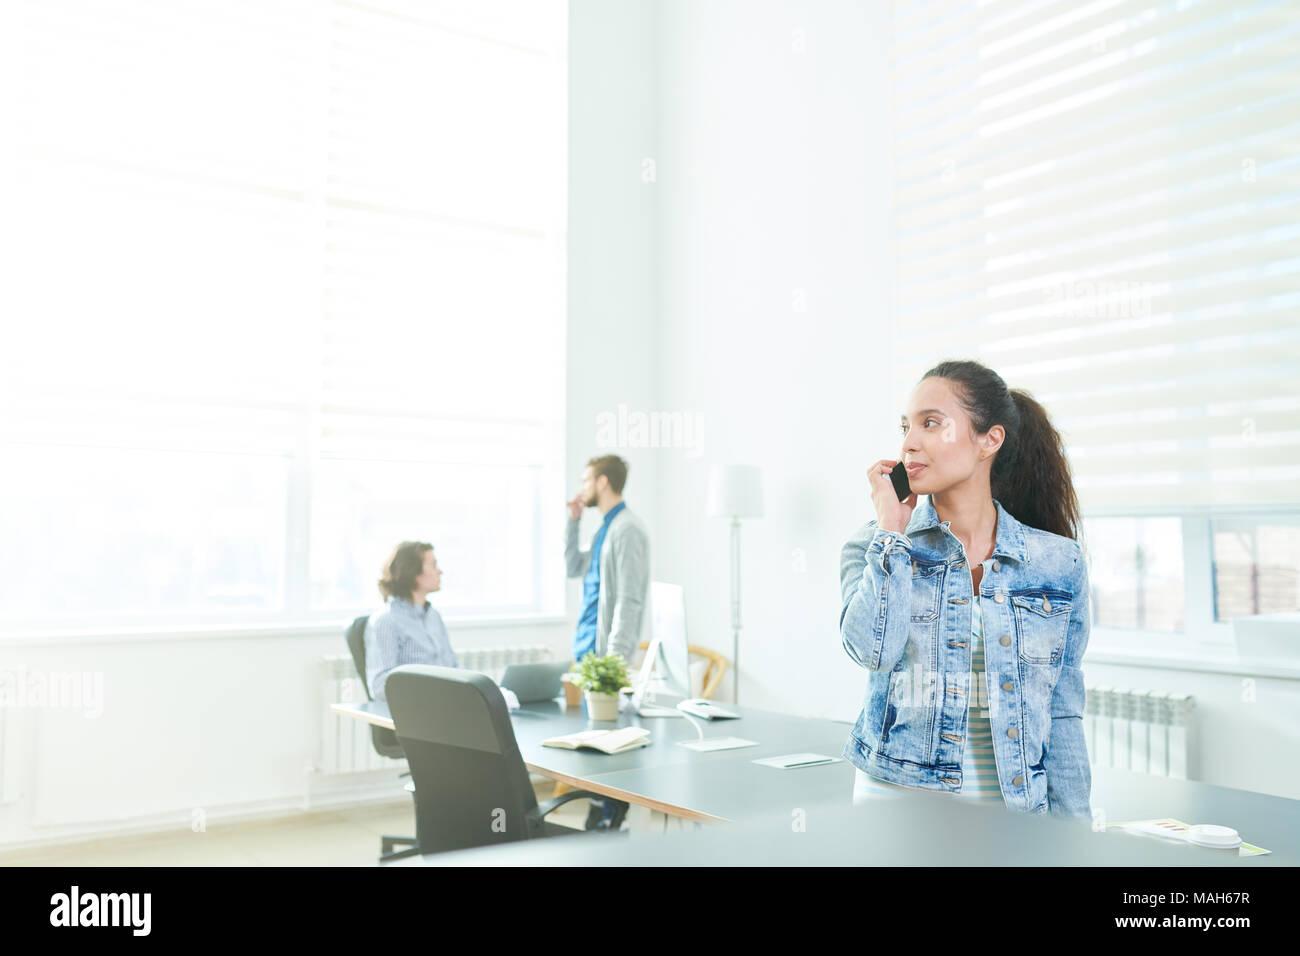 Purposeful business lady speaking on phone - Stock Image